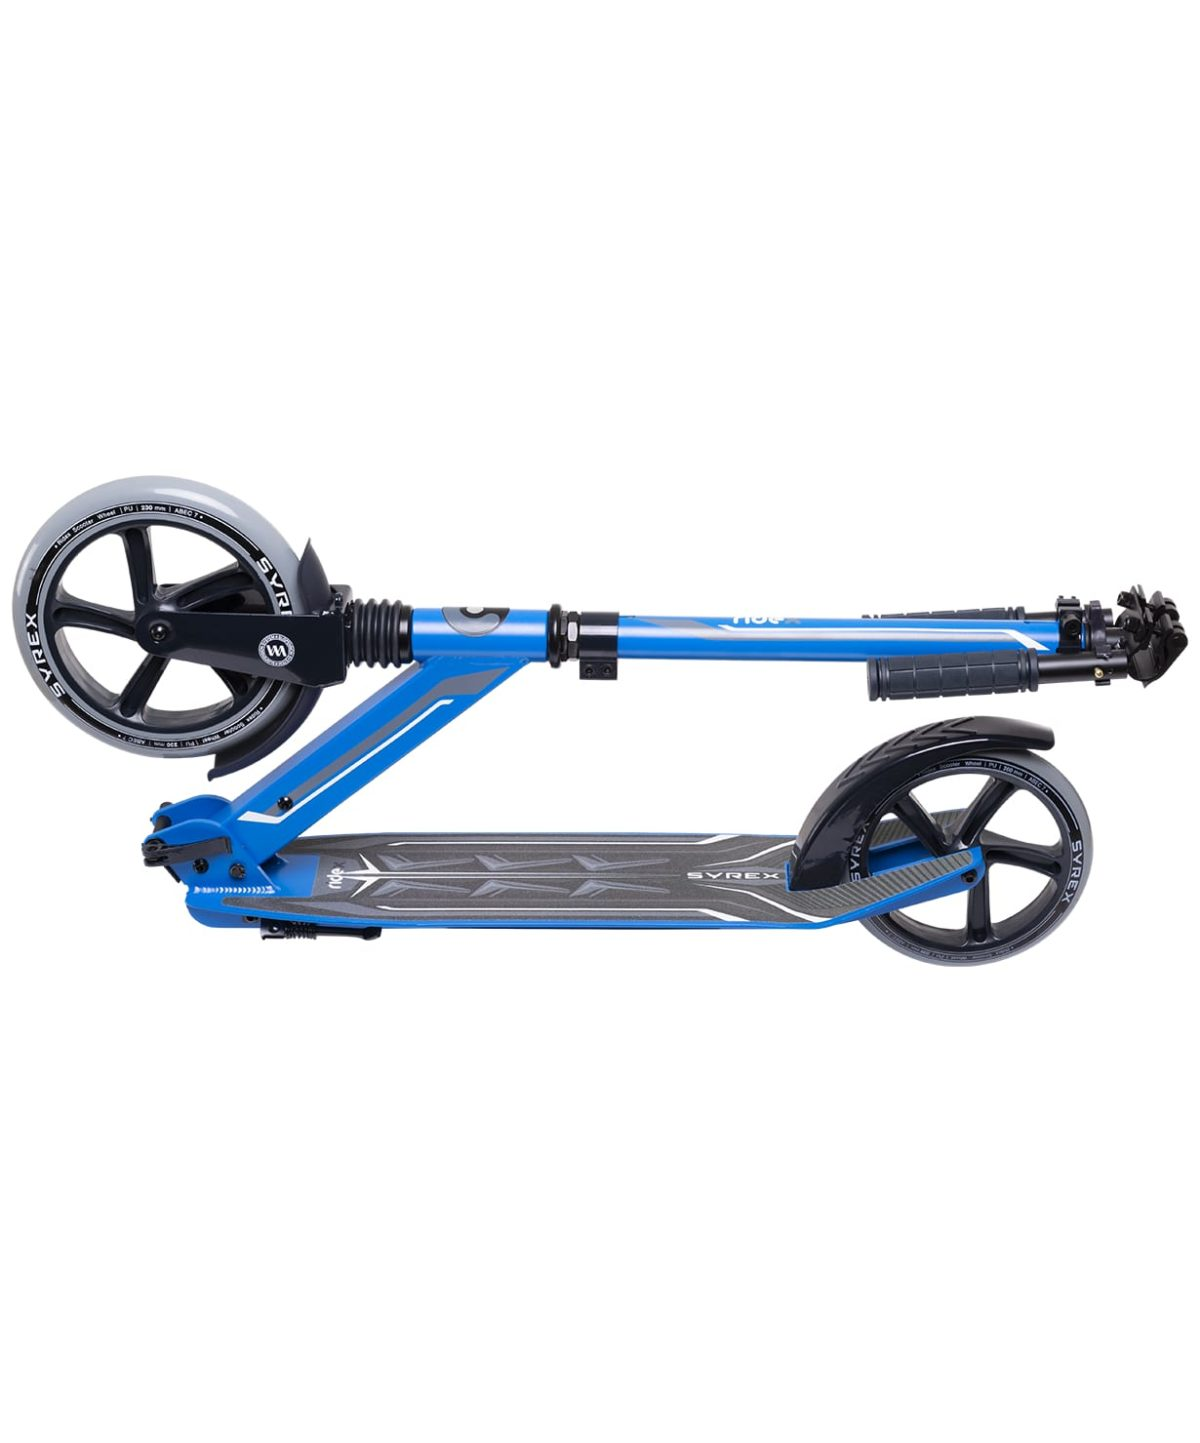 RIDEX Syrex Самокат 2-колесный  230/200 мм  Syrex: синий - 5